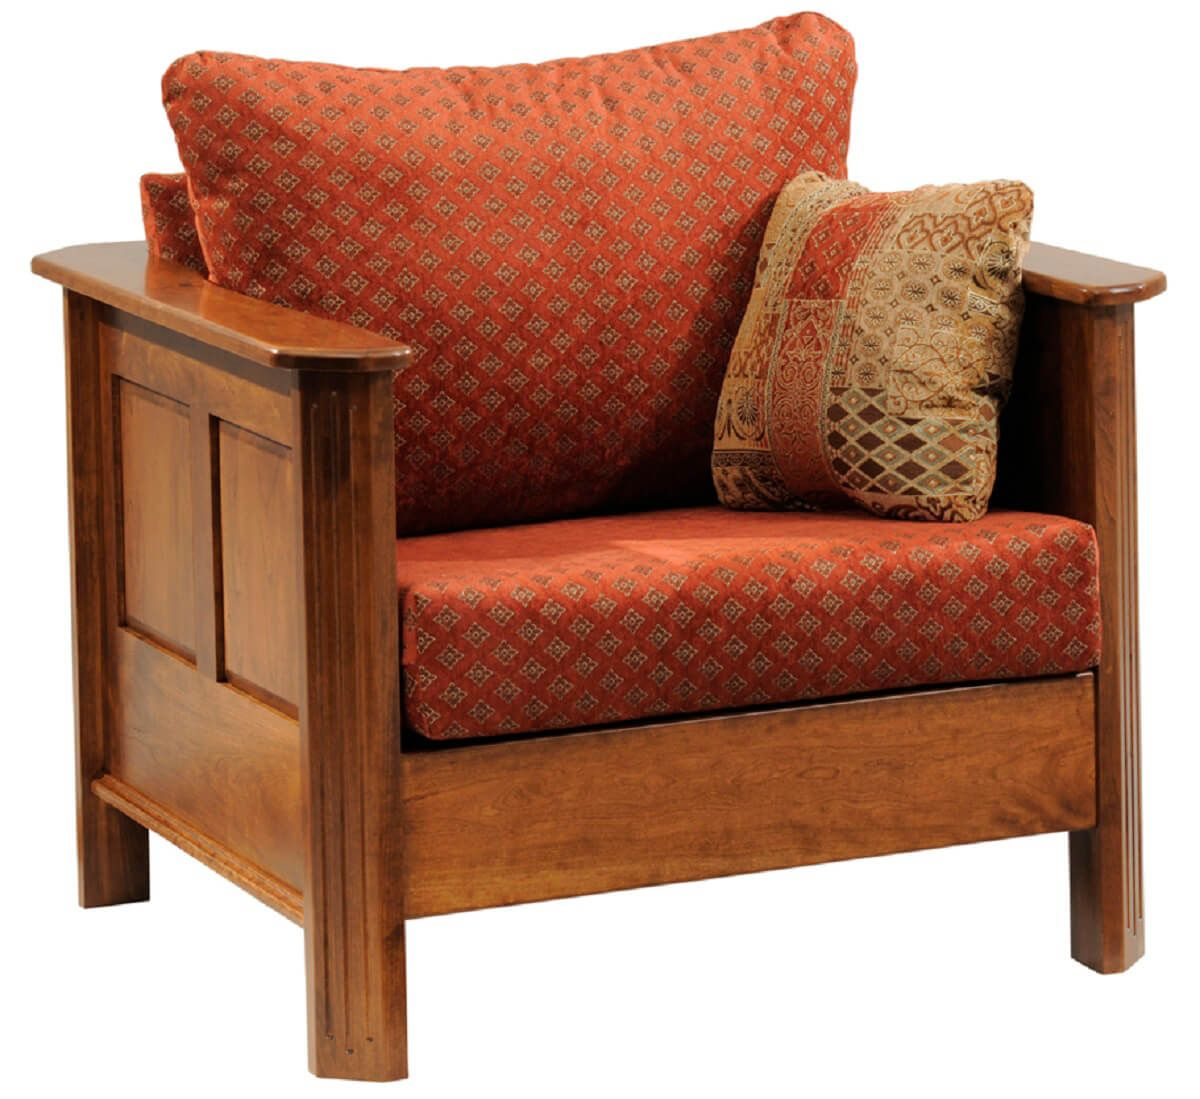 Manero Chair